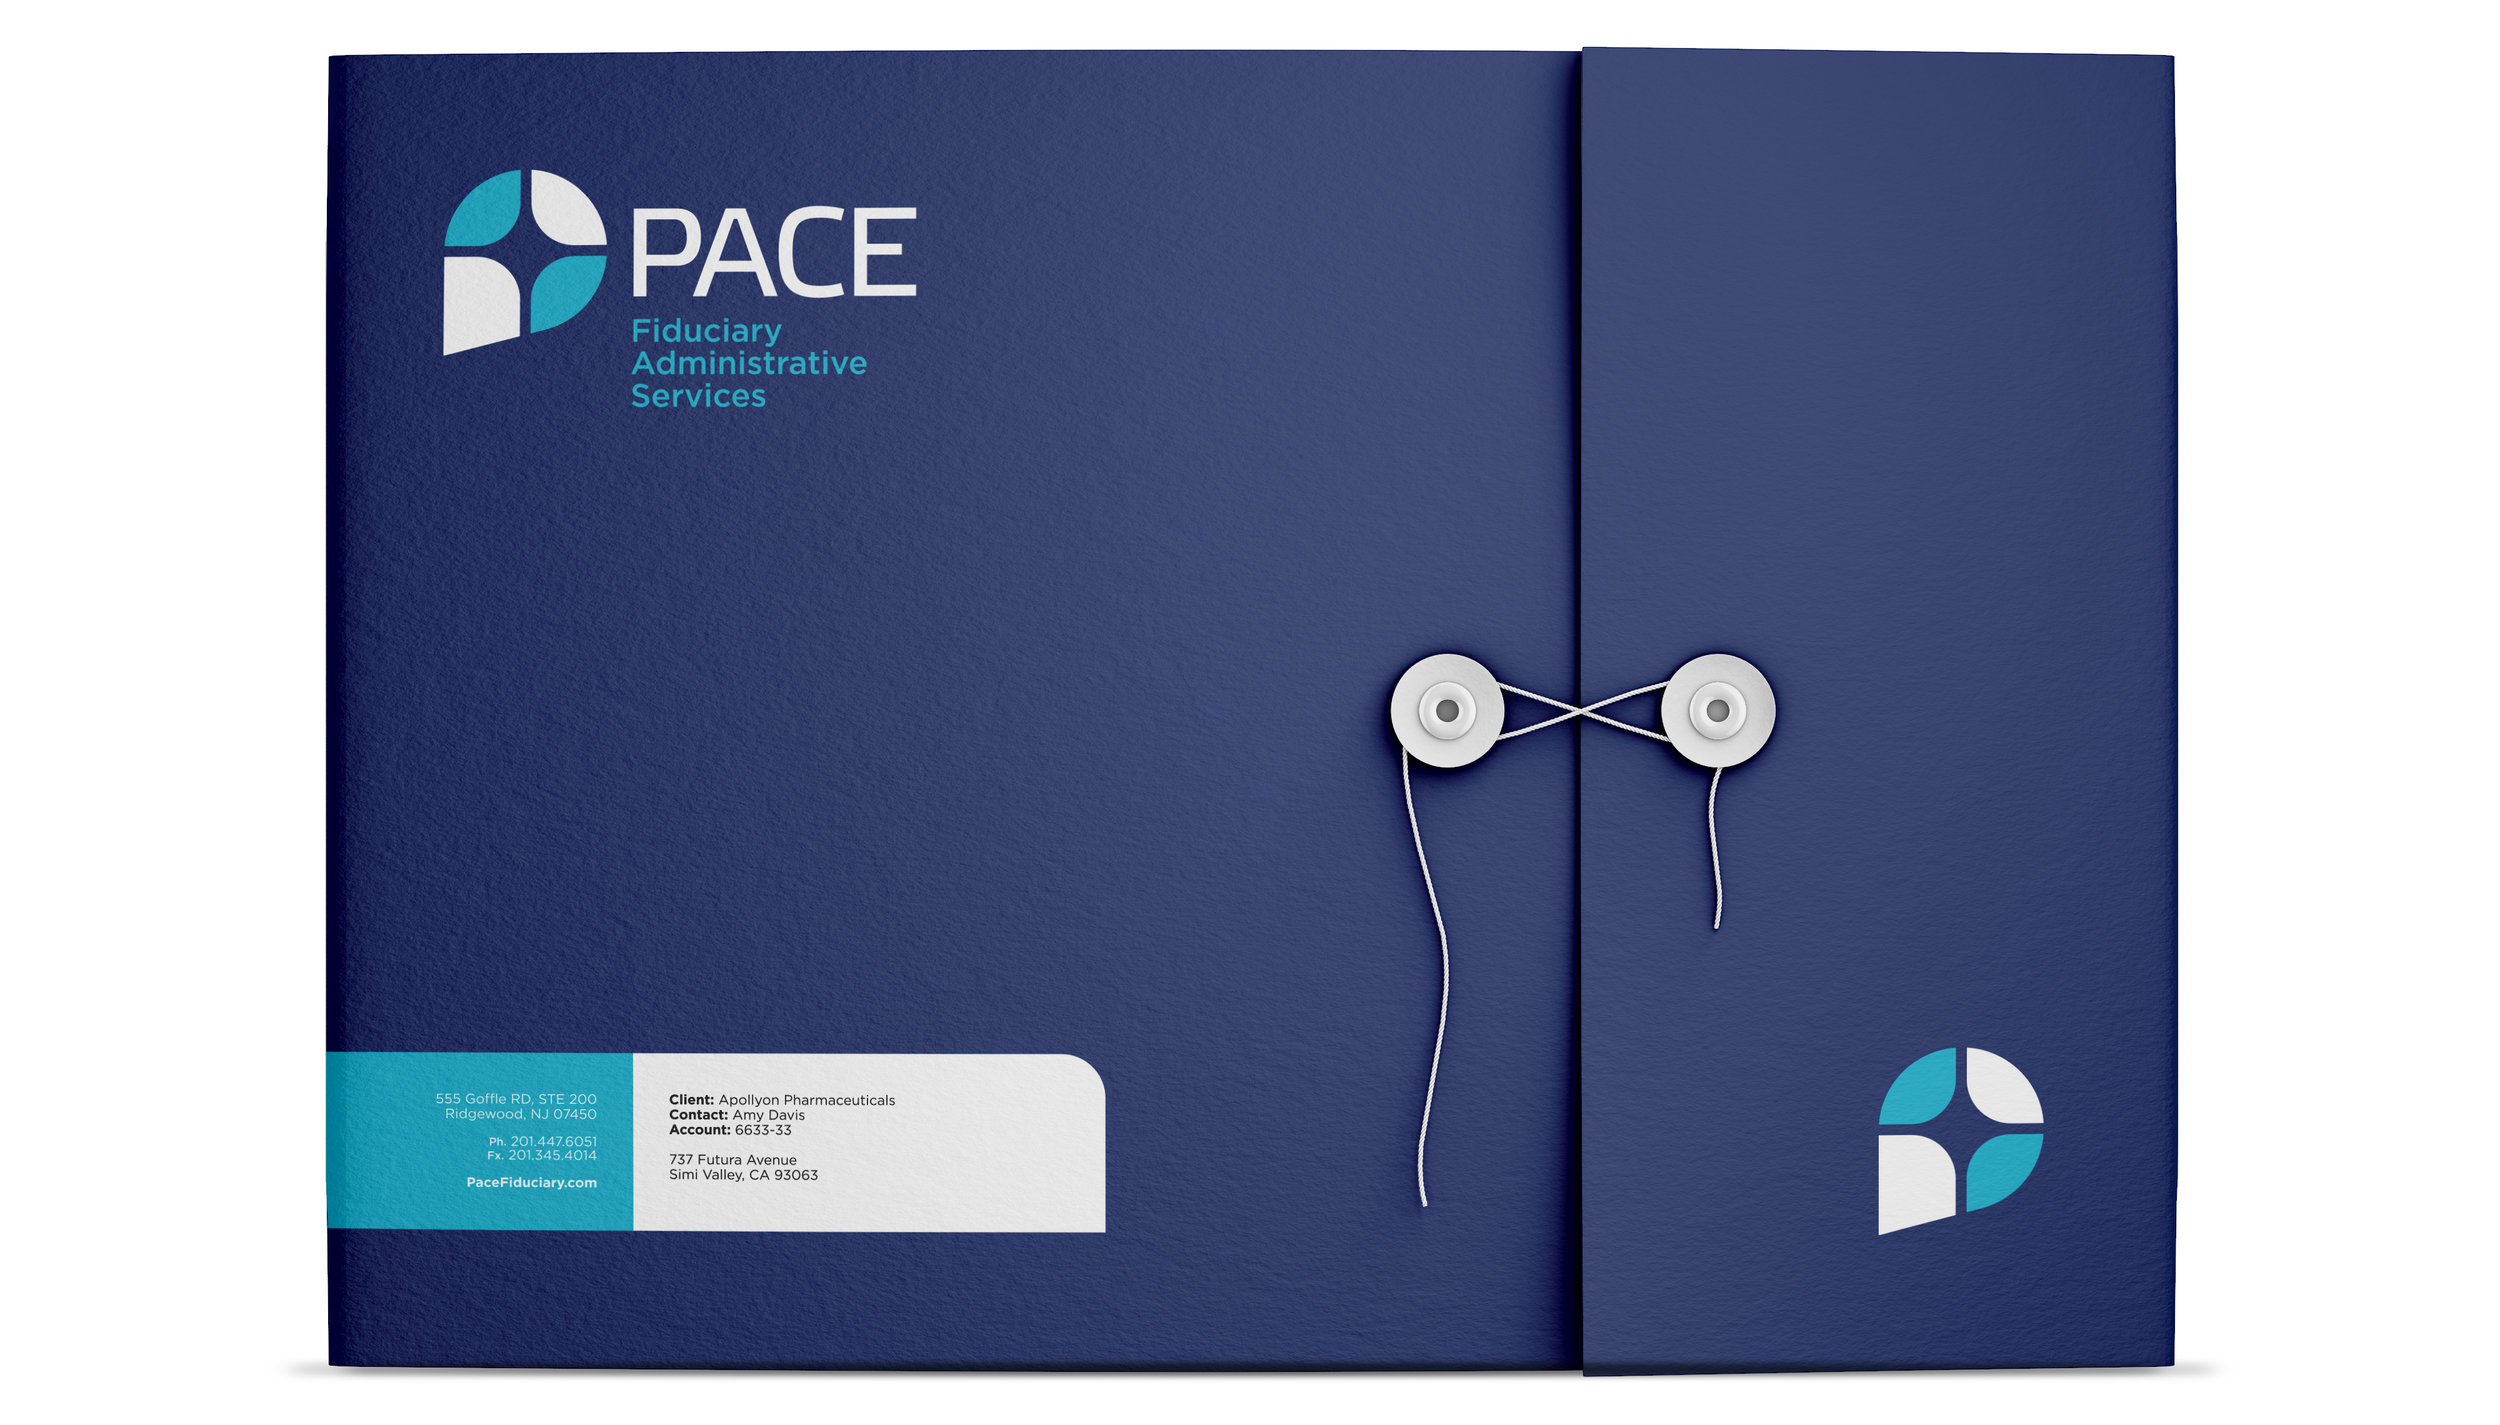 Pace7.jpg